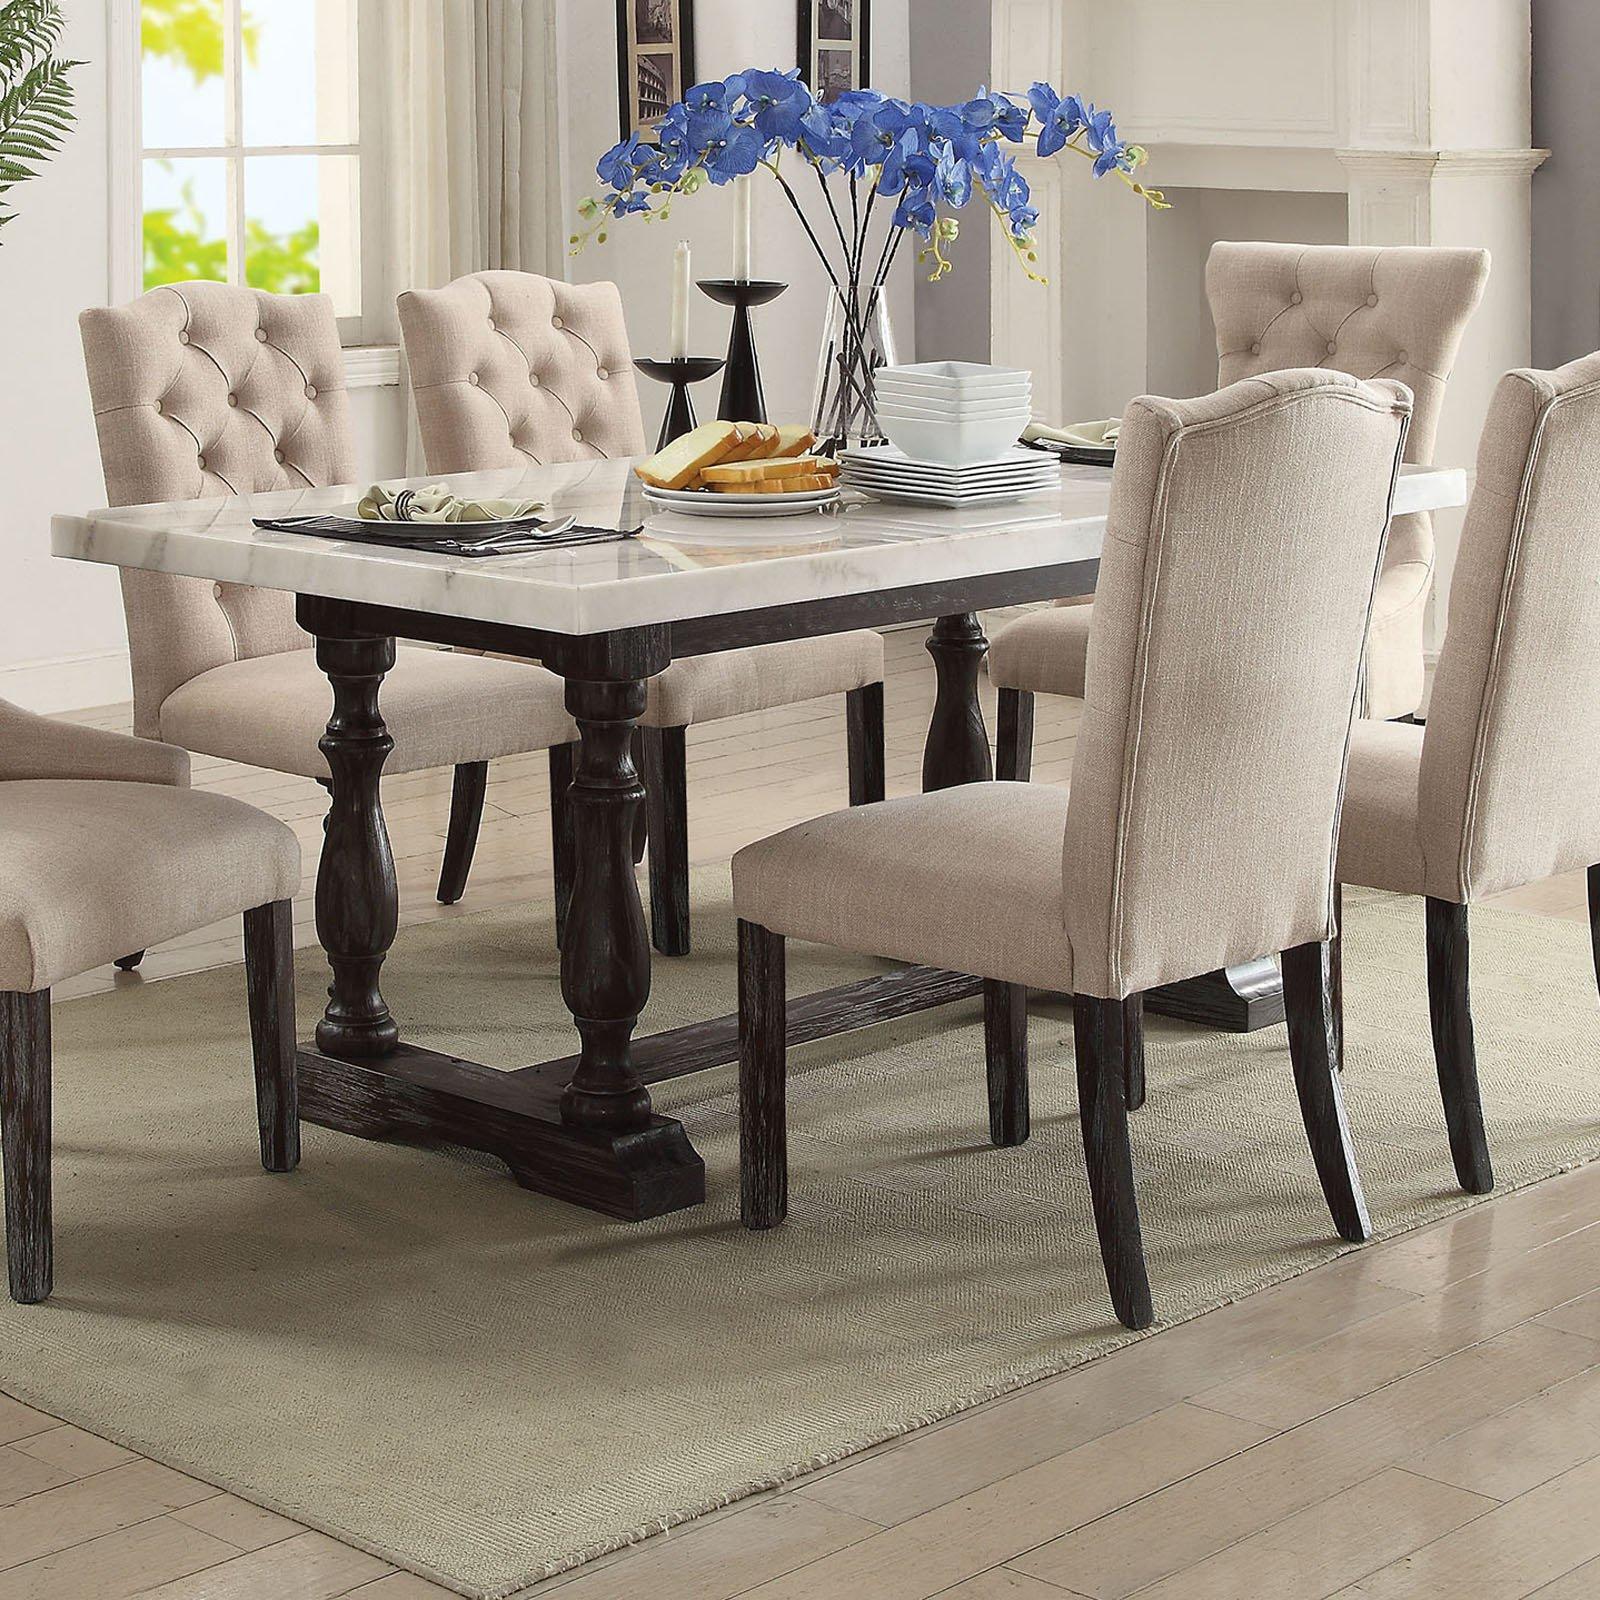 Acme Furniture Gerardo 72 In Rectangular Marble Dining Table In